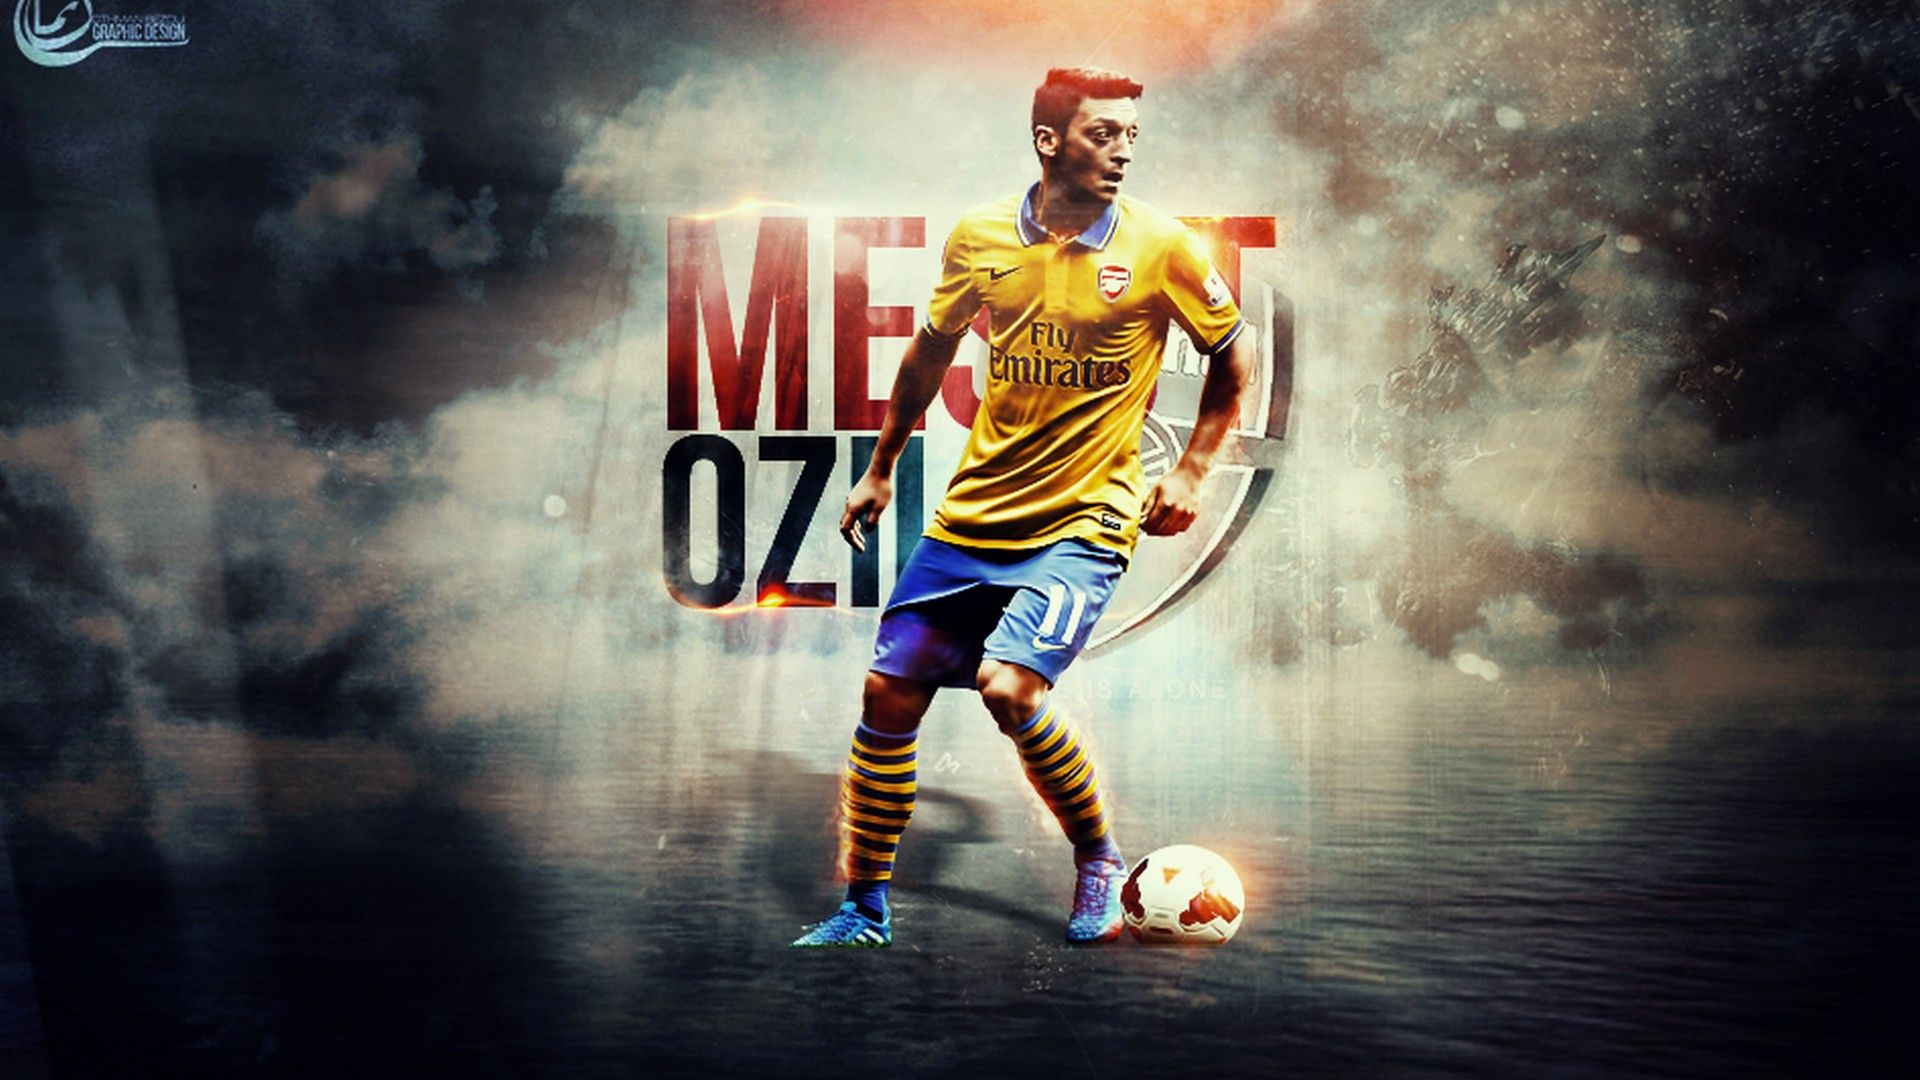 mesut ozil arsenal wallpaper 2021